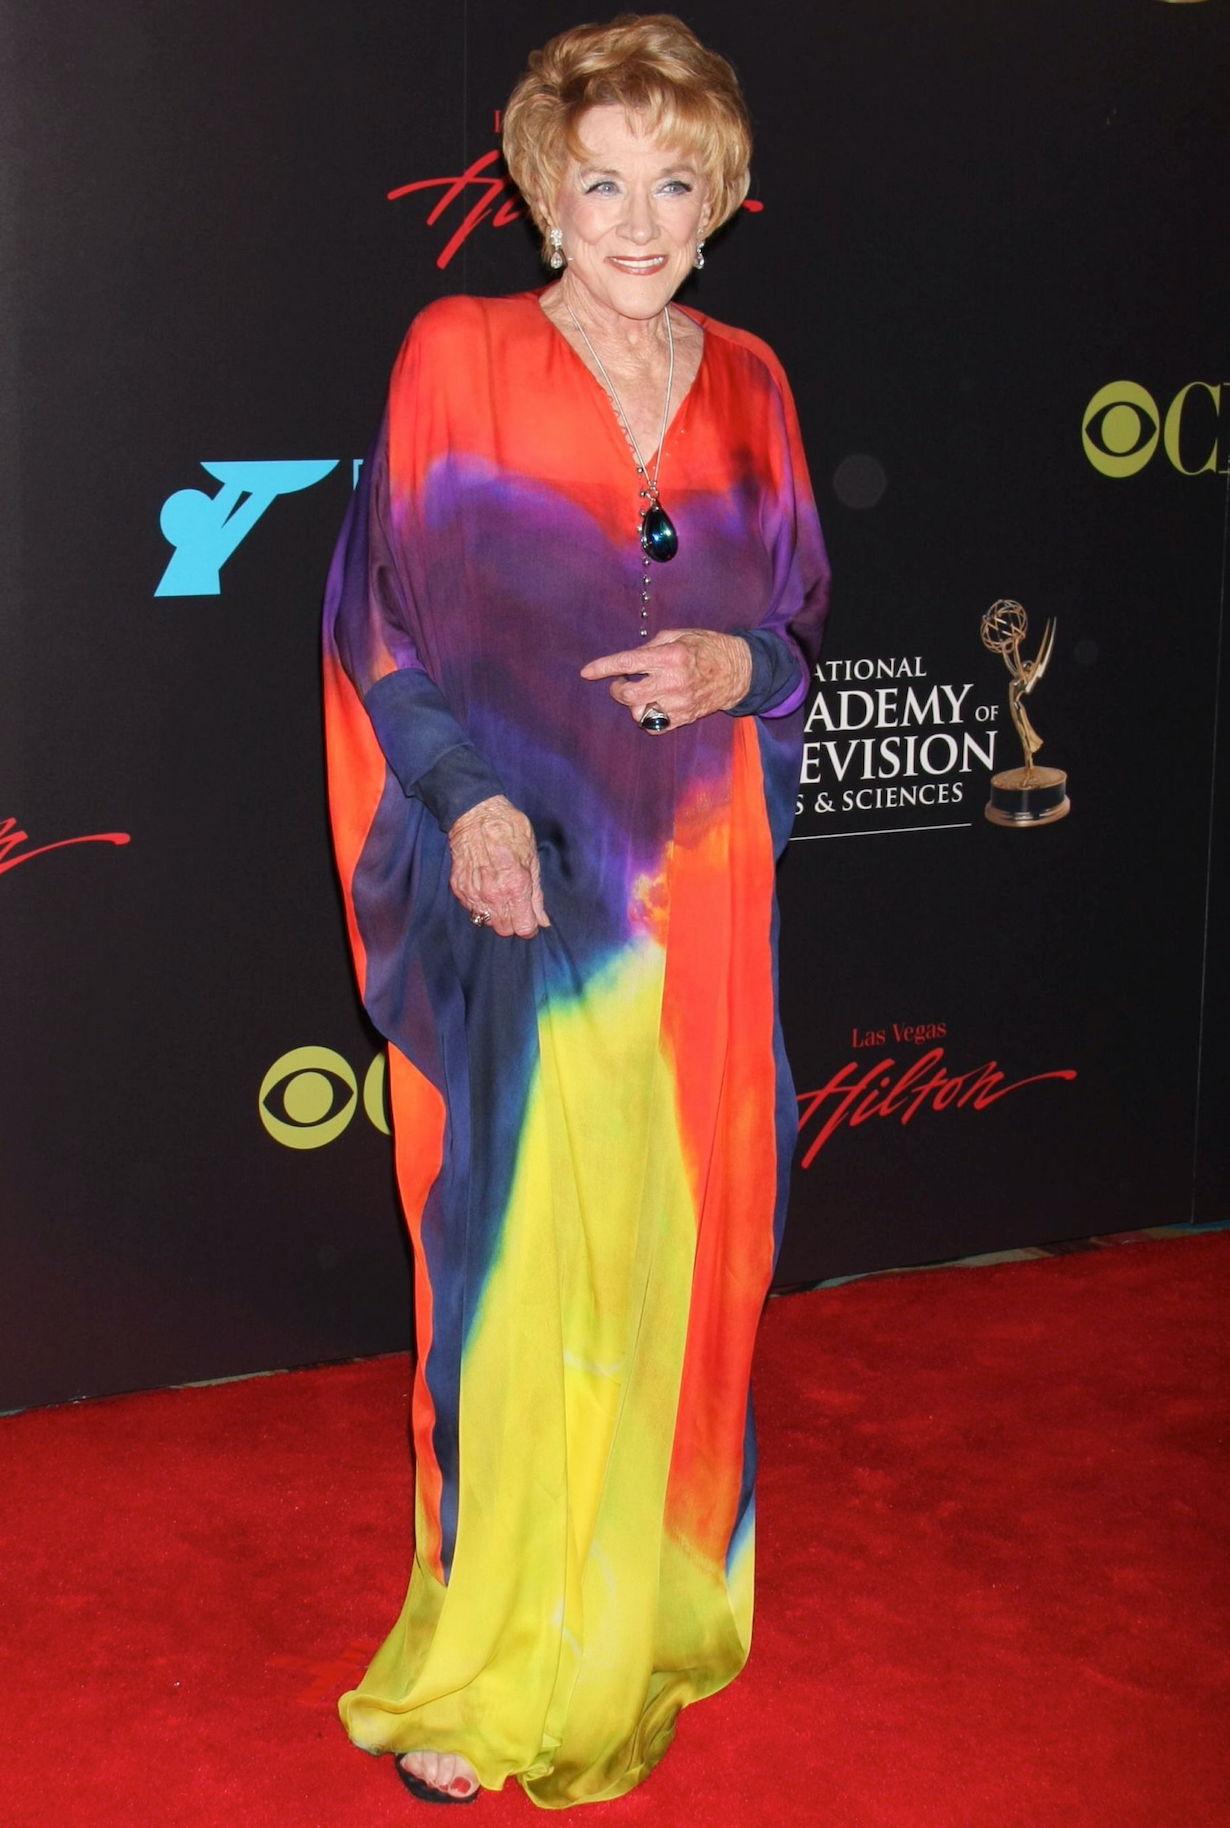 Jeanne Cooper 37th Annual Daytime Emmy Awards - Arrivals Las Vegas Hilton Las Vegas 6/27/10 © Howard Wise/jpistudios.com 310-657-9661